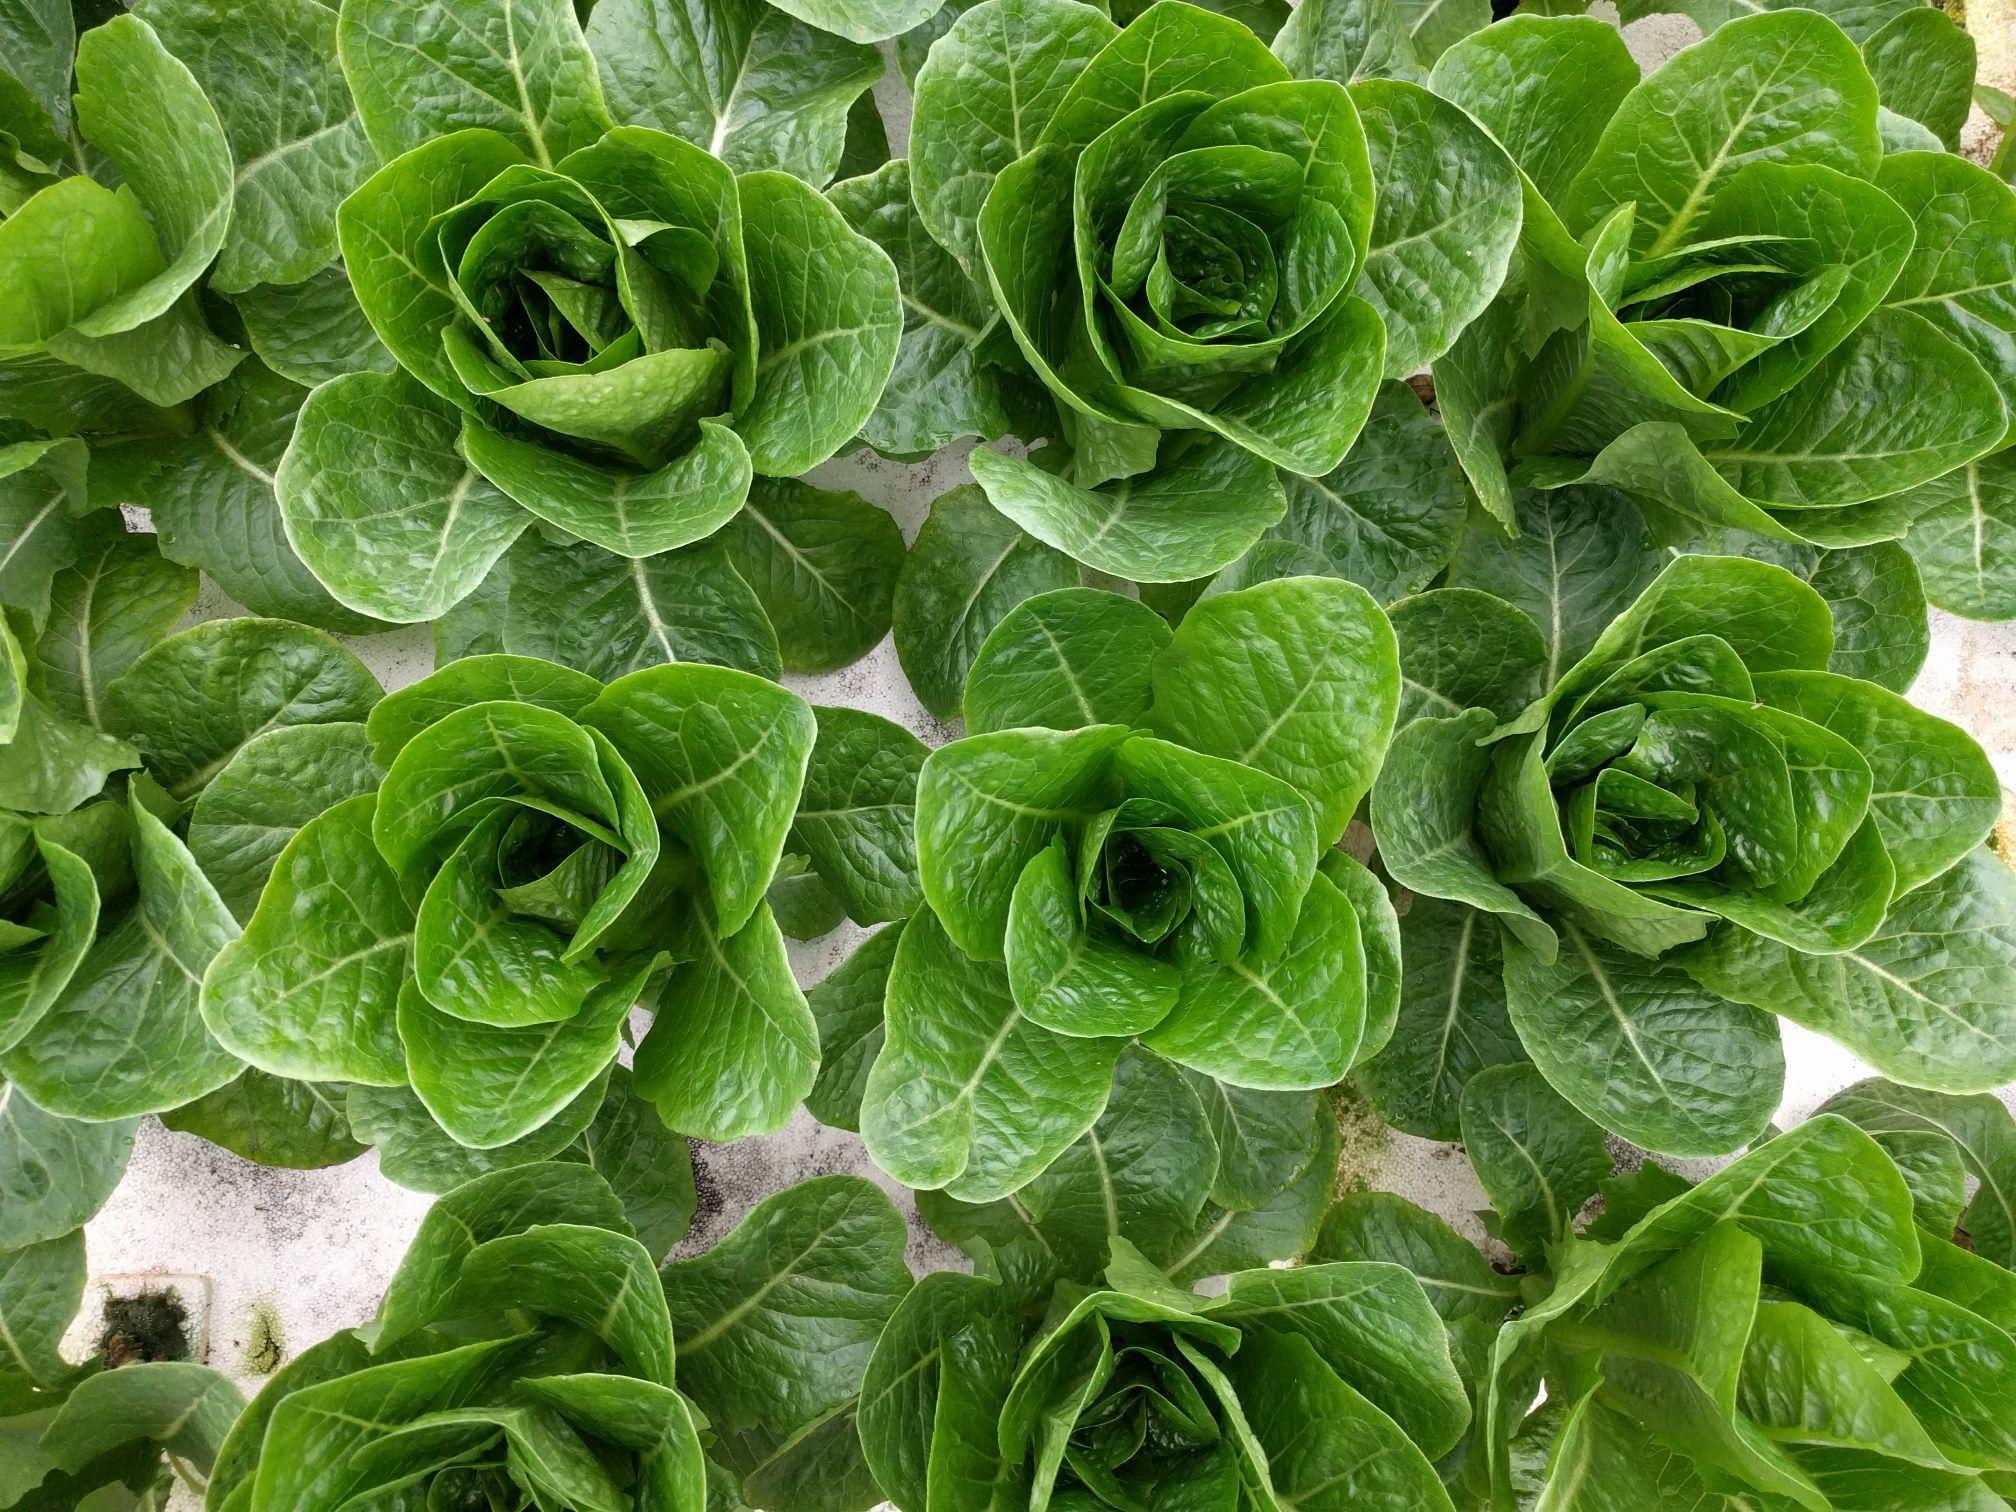 Lettuce from Lettuce Heads Farm (Wellington, OH)